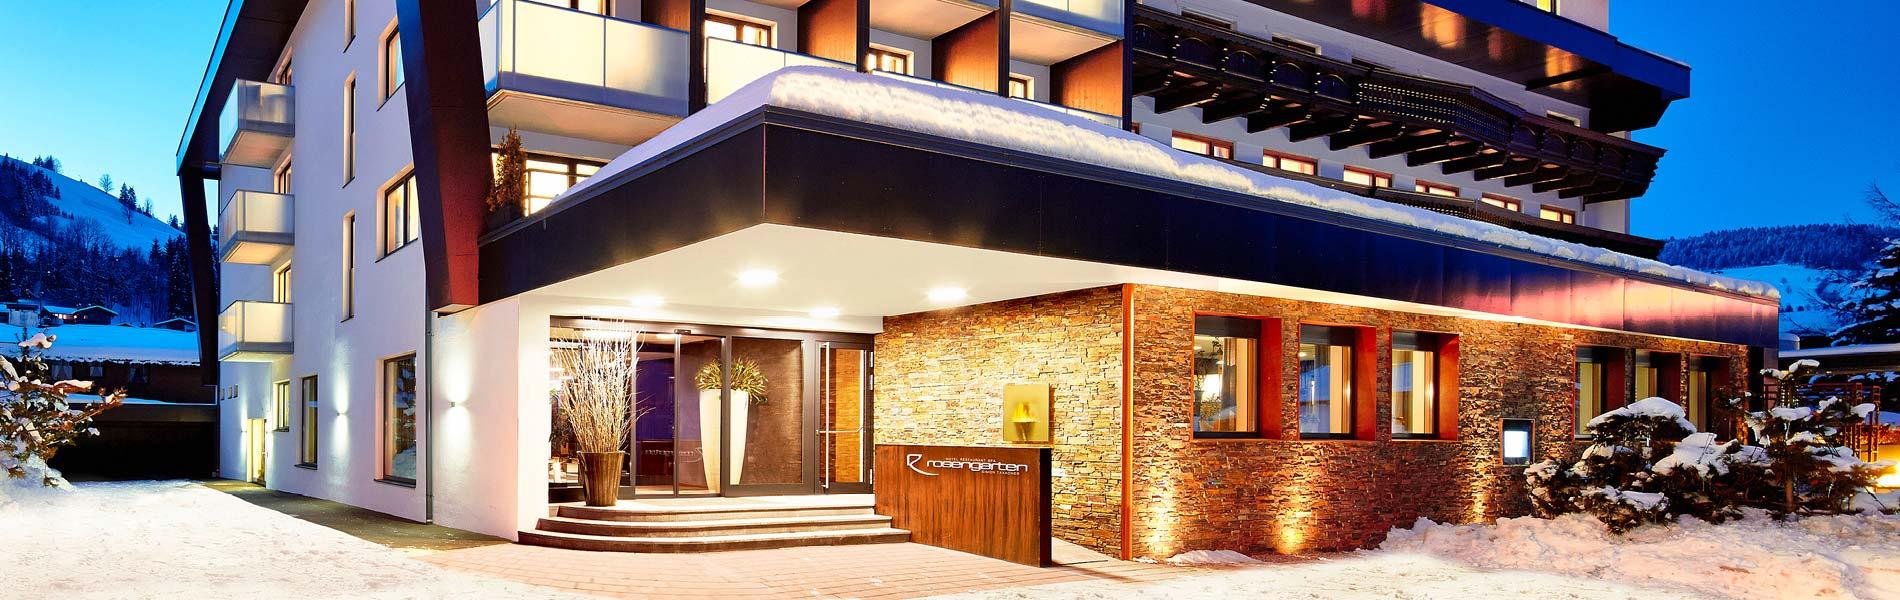 Hotel_Restaurant_Spa_Rosengarten_Kirchberg_Tirol_5-Sterne_Lifestyle_Hotel_Aussenansicht-Winter_1900-600